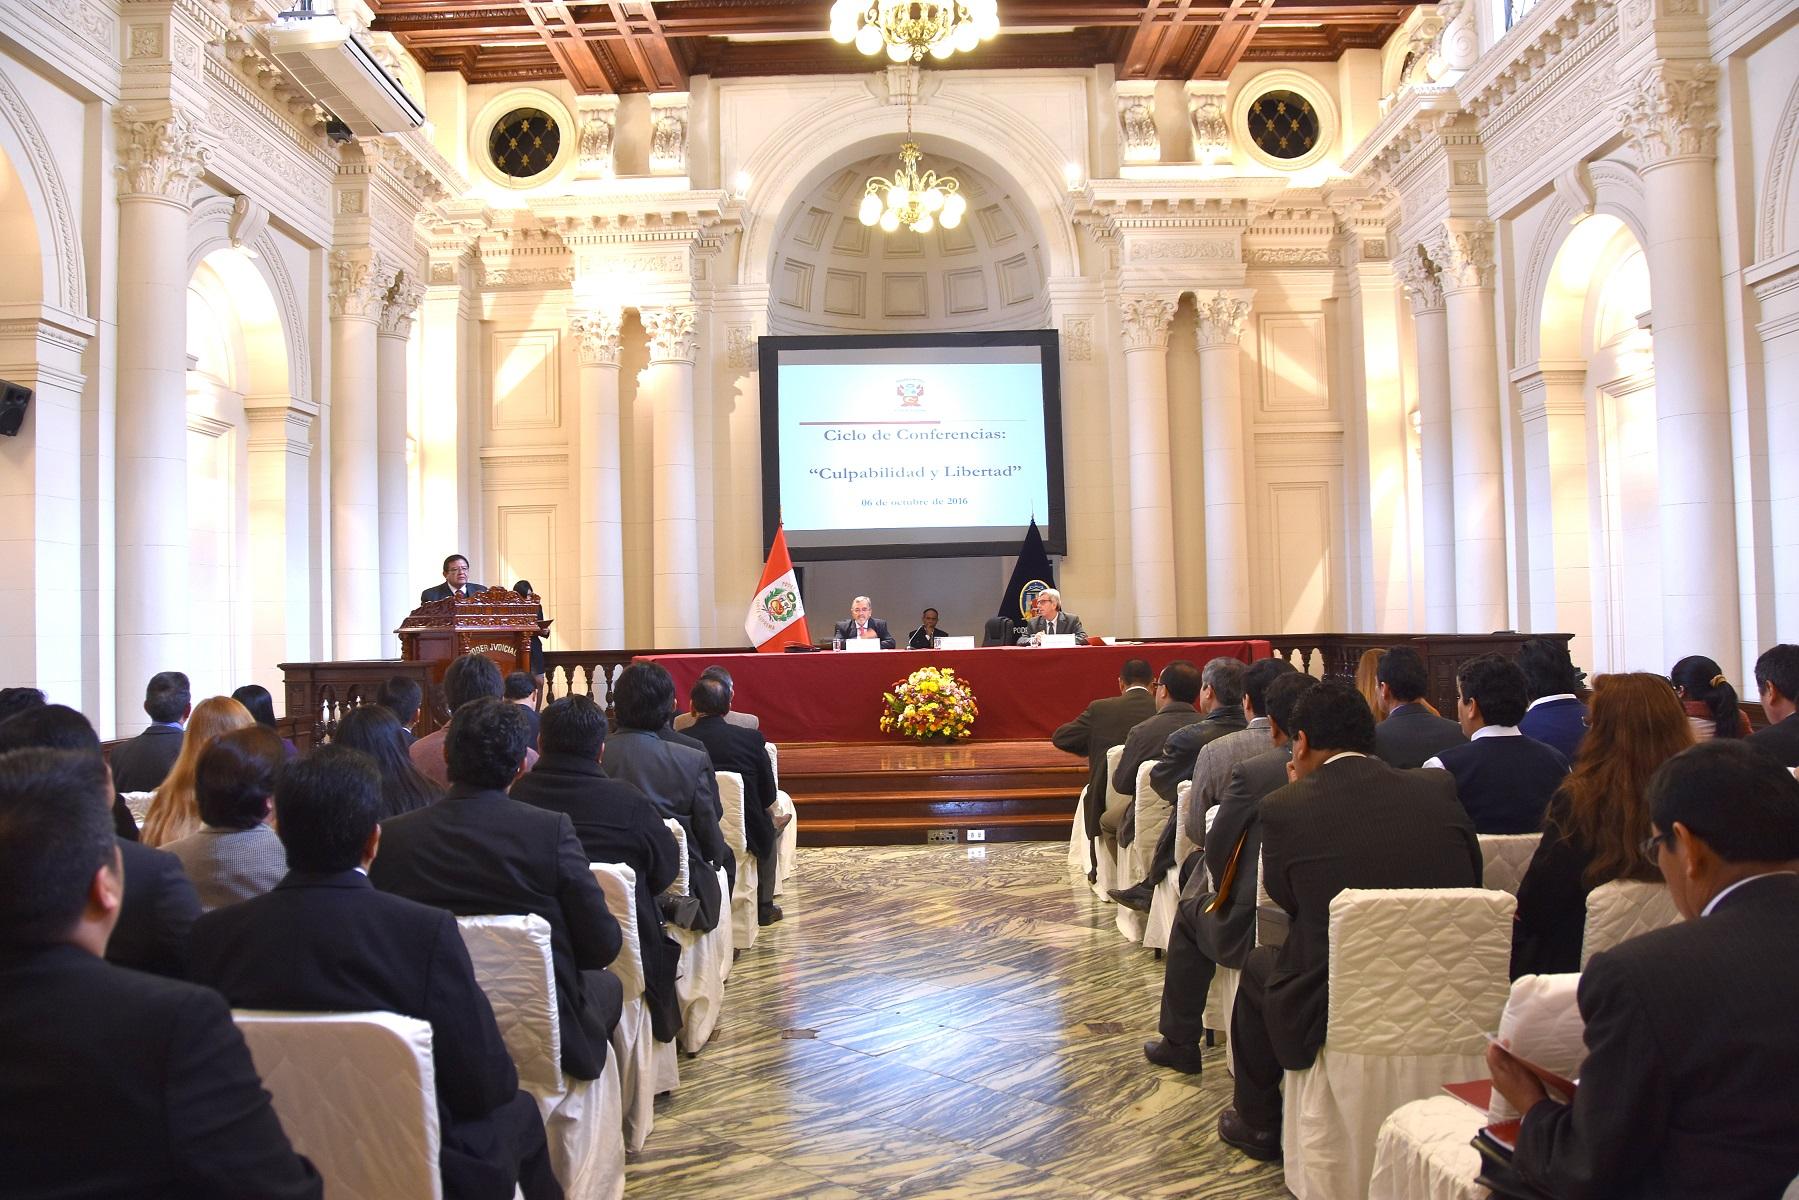 2016-10-6 CSJ Peru8, Present JorgeLSalas Confer DL Culpab-libert 2253